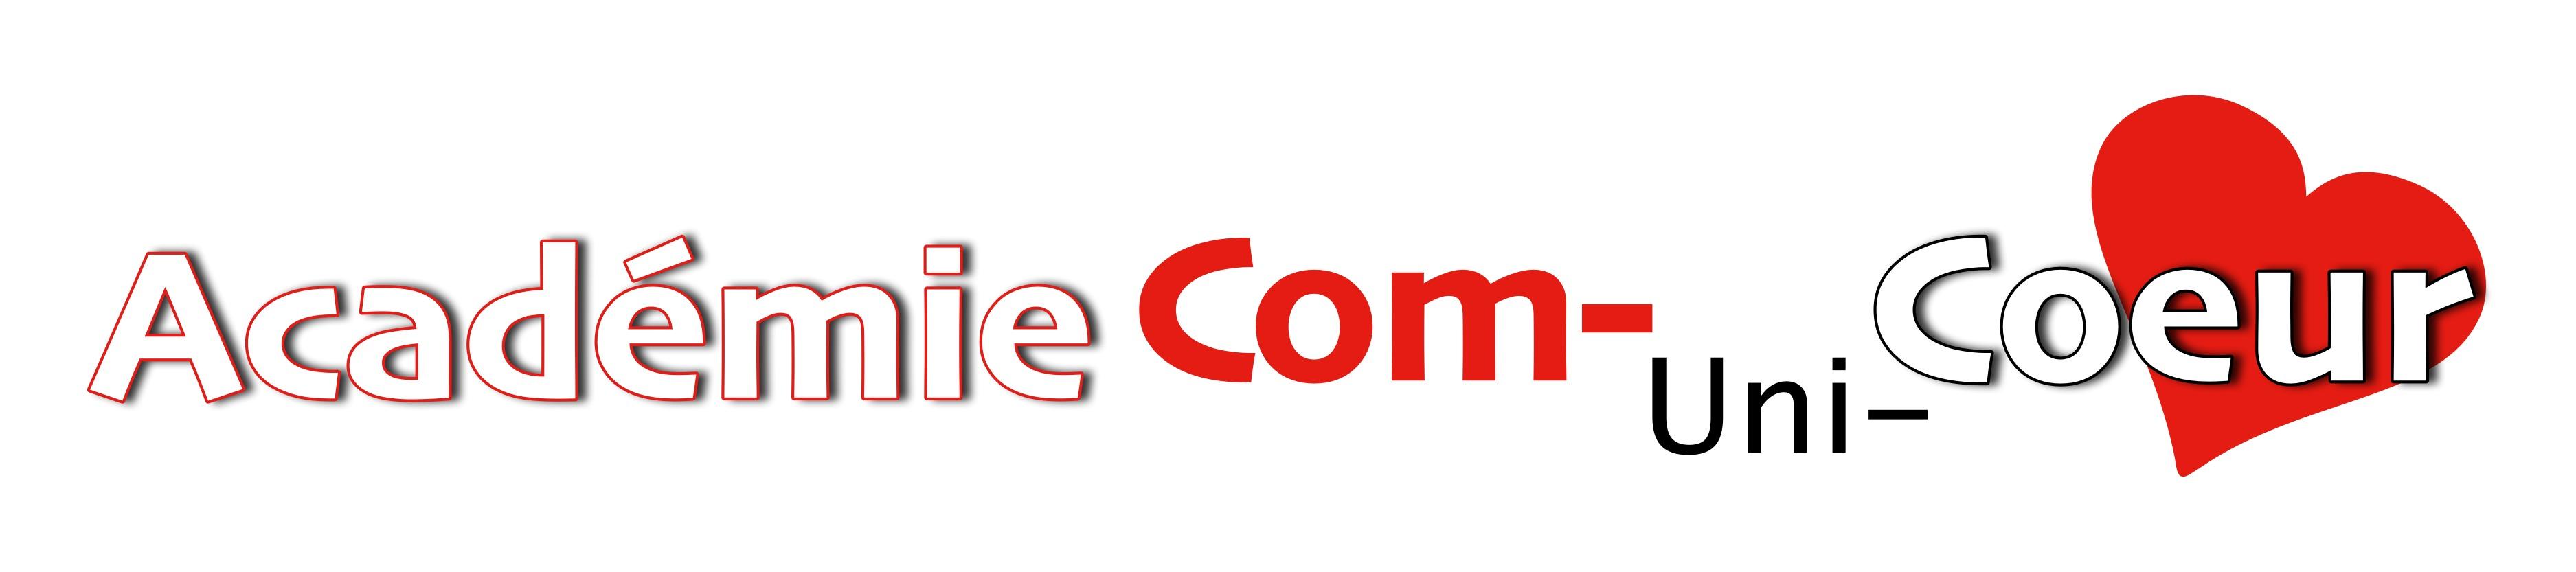 Académie Com-Uni-Coeur 900x200